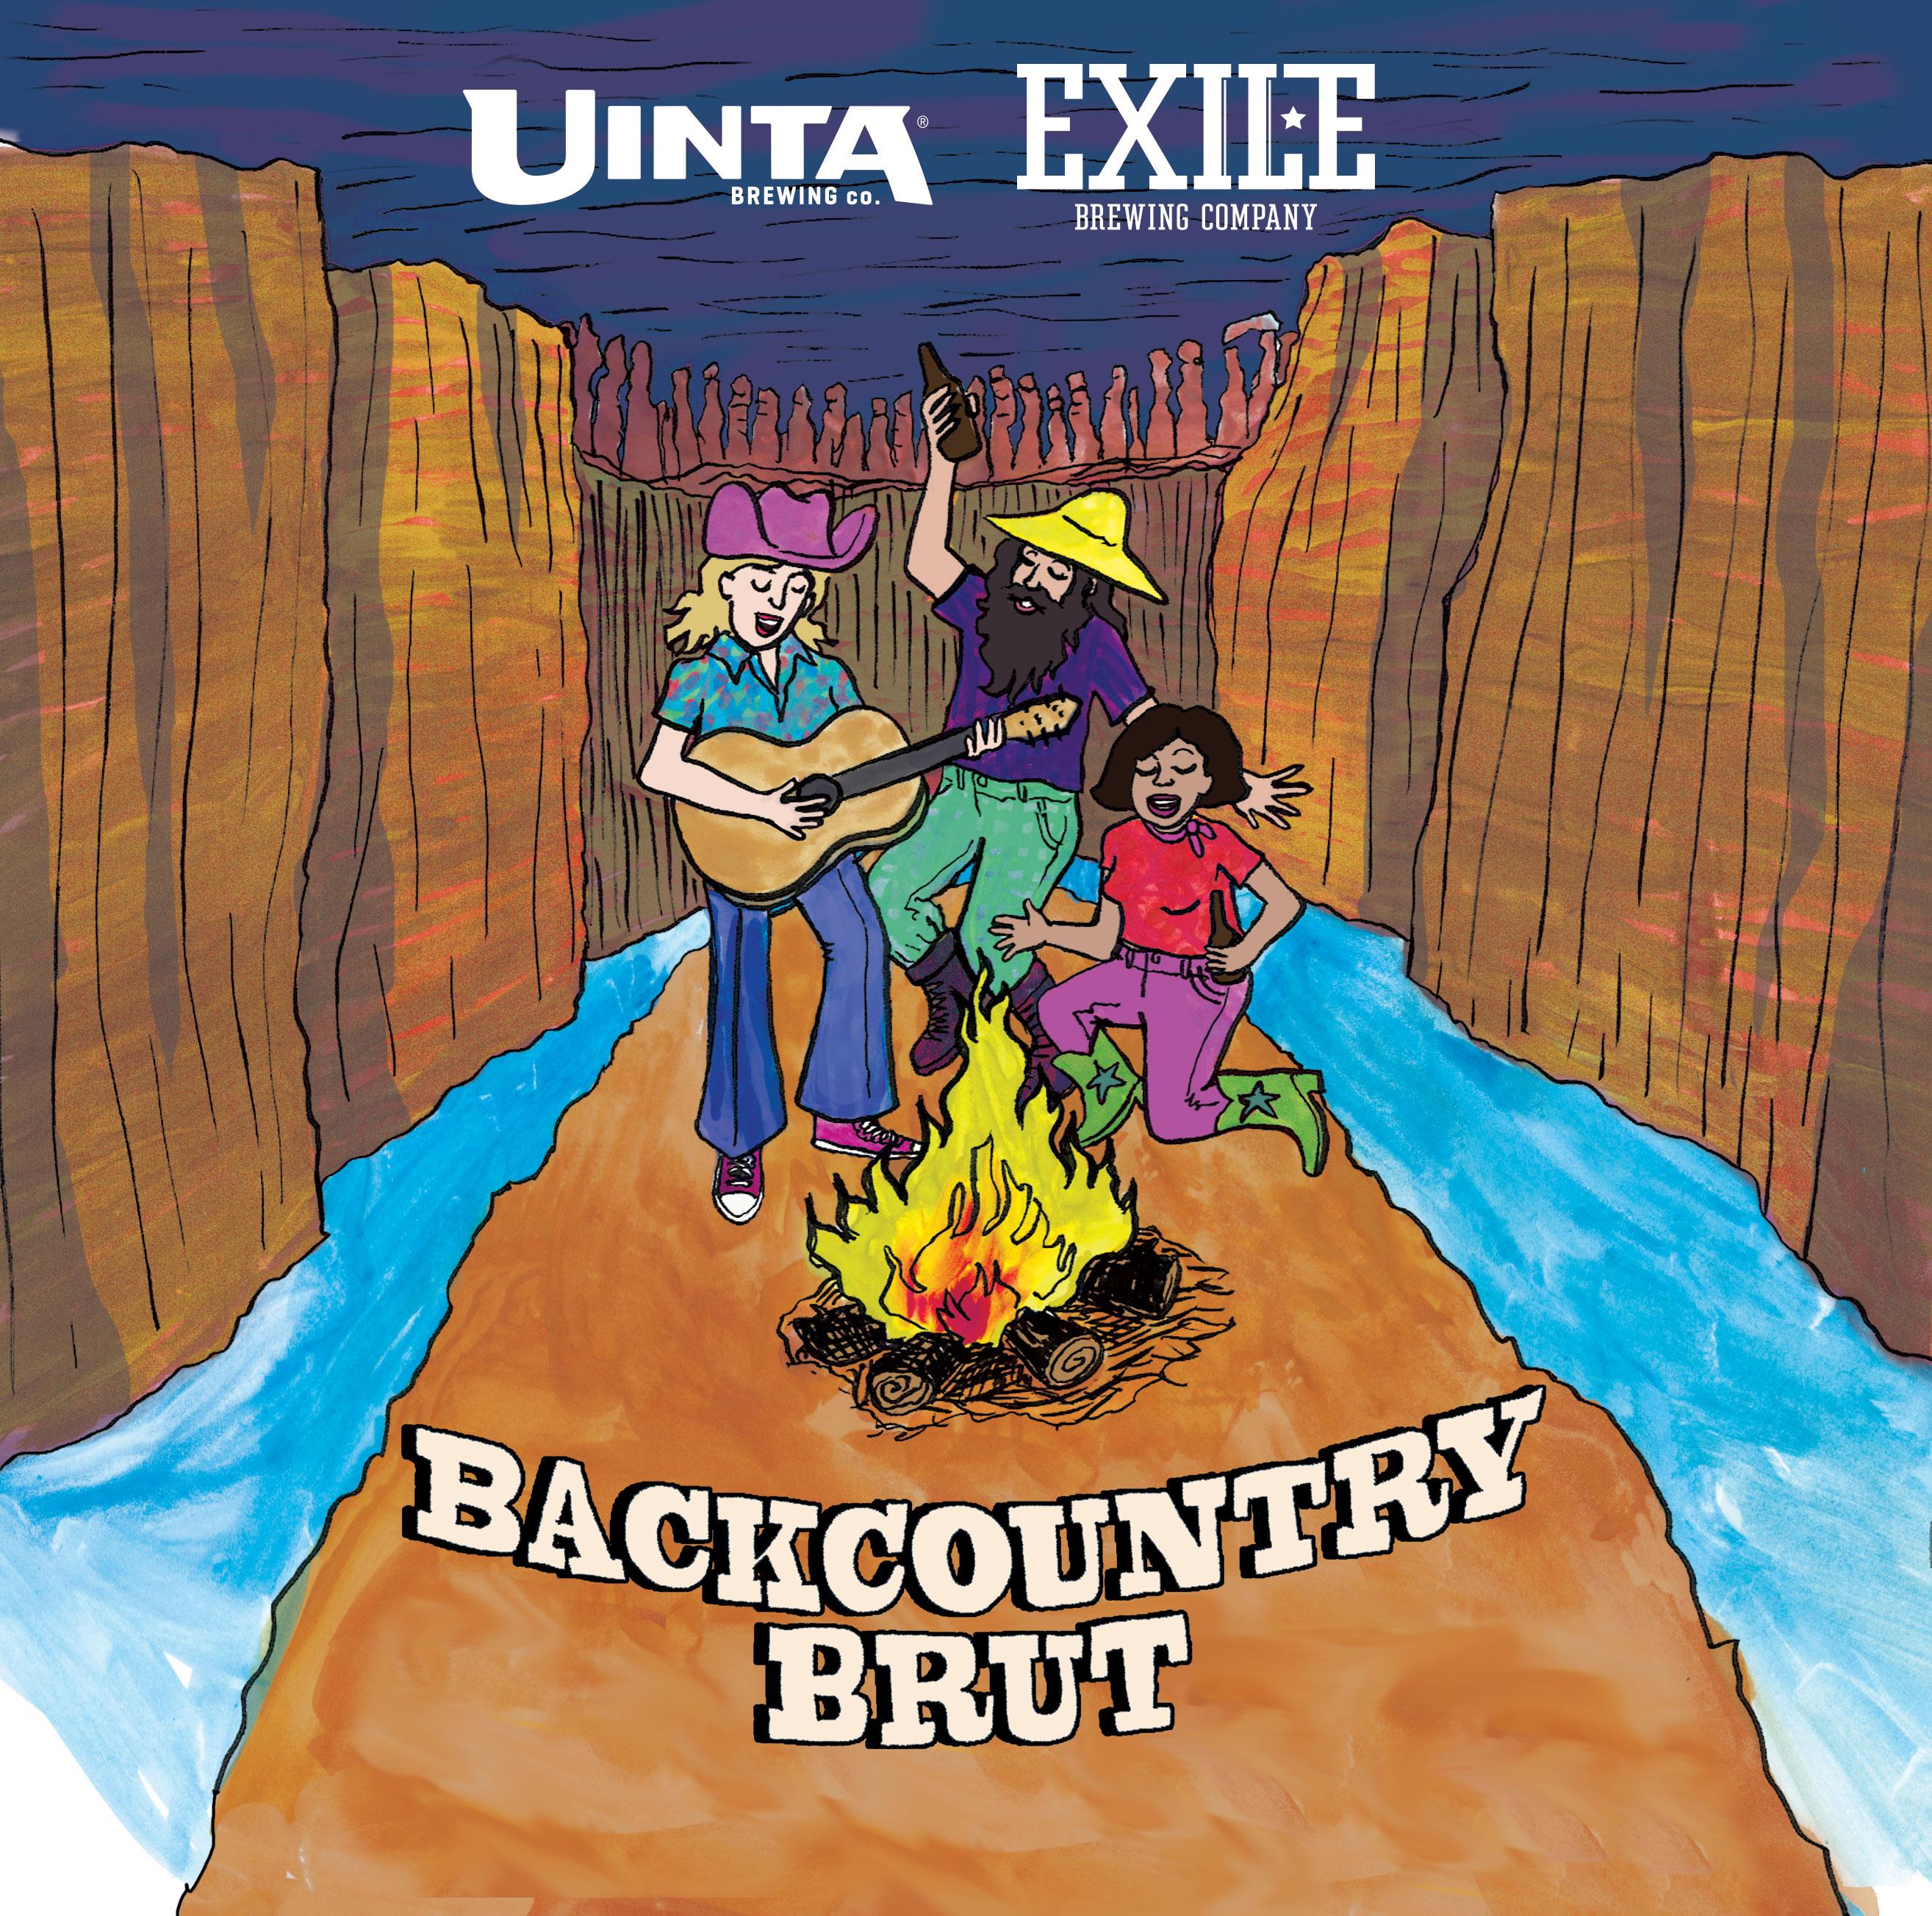 Backcountry-Brut-press-release.jpg